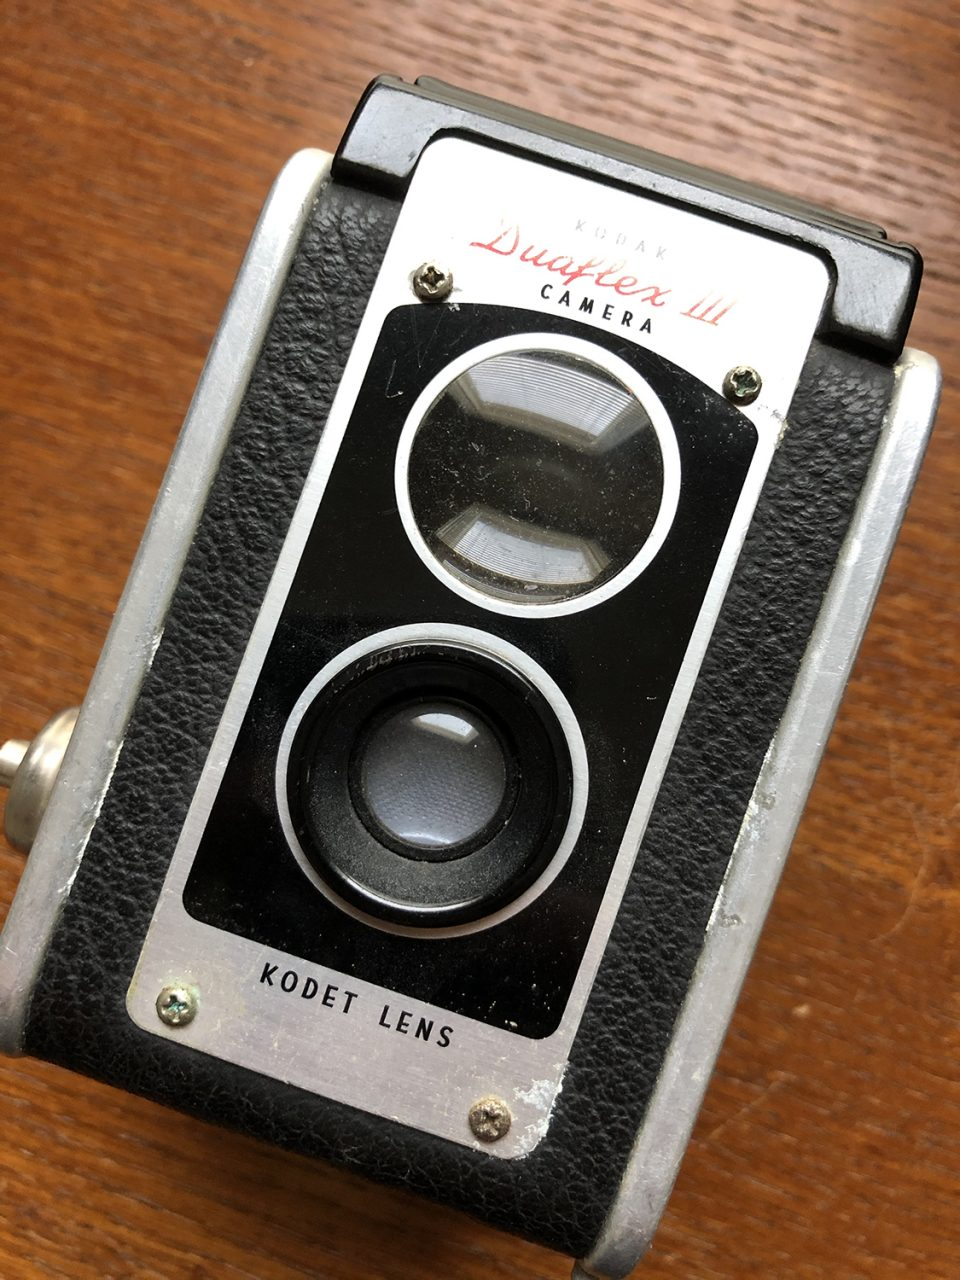 Kodak Duaflex III with Kodet lens, circa 1950s. Photograph by Keith Dotson.